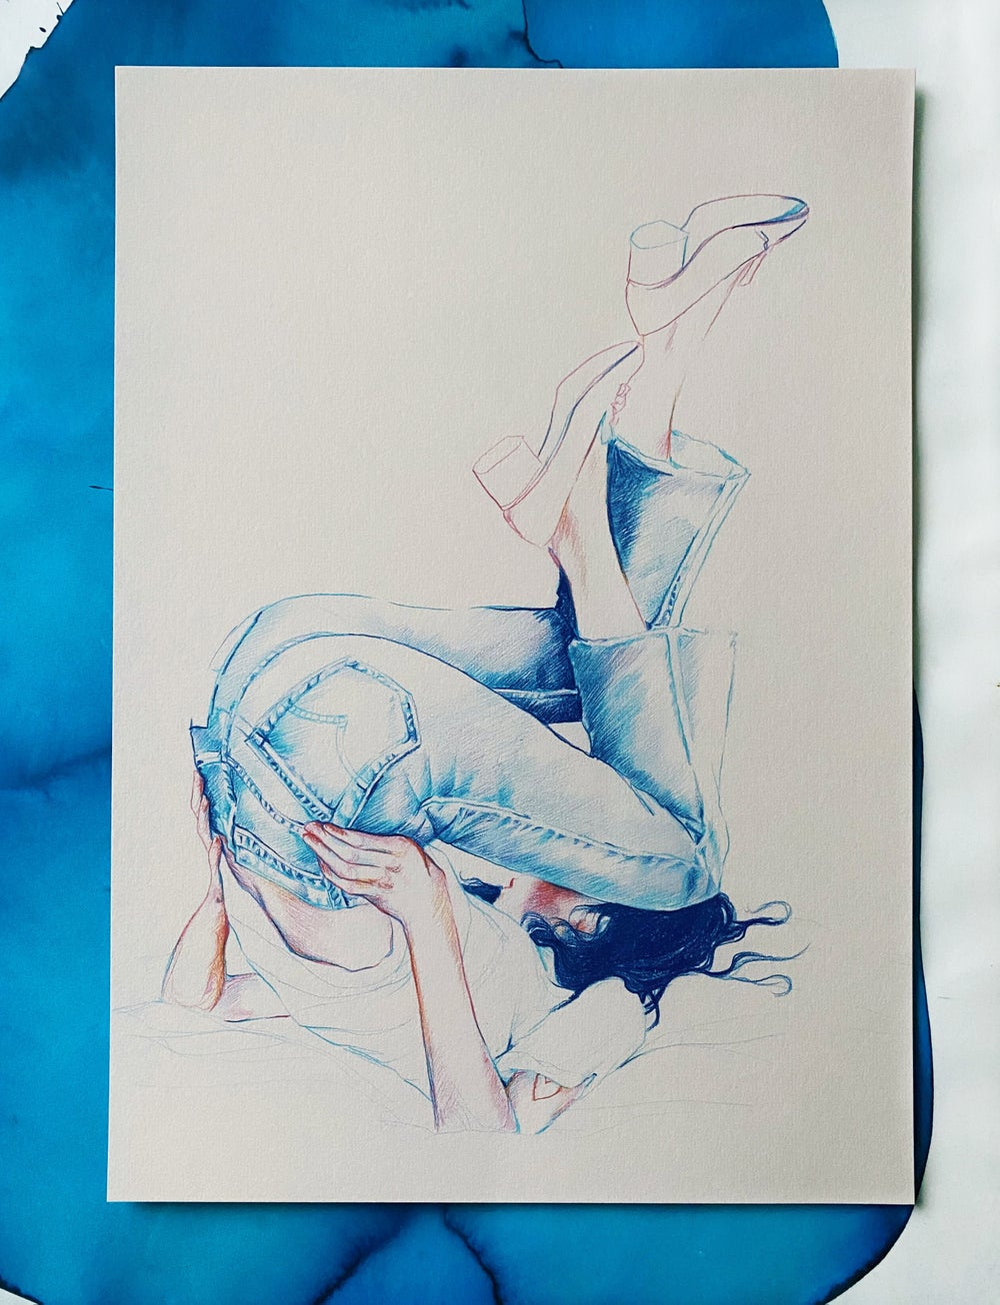 Image of Stretch pt 2